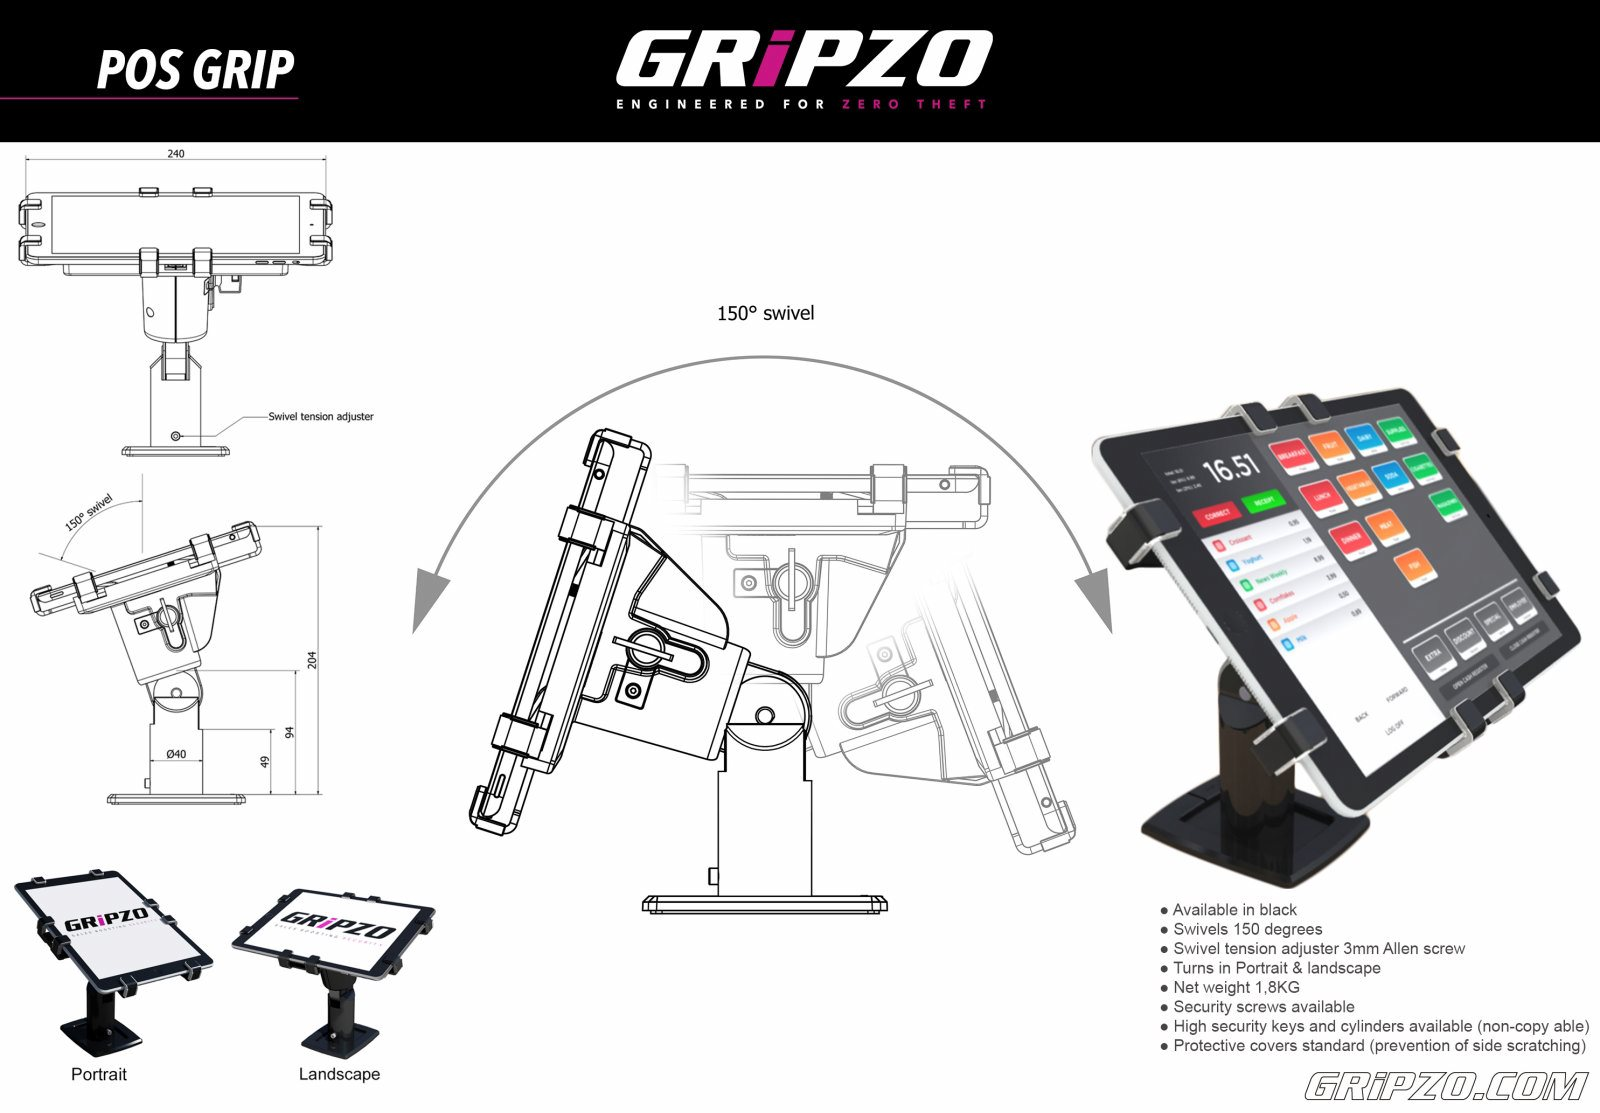 gripzo-pos-grip-product-sheet-19-1-2015.jpg